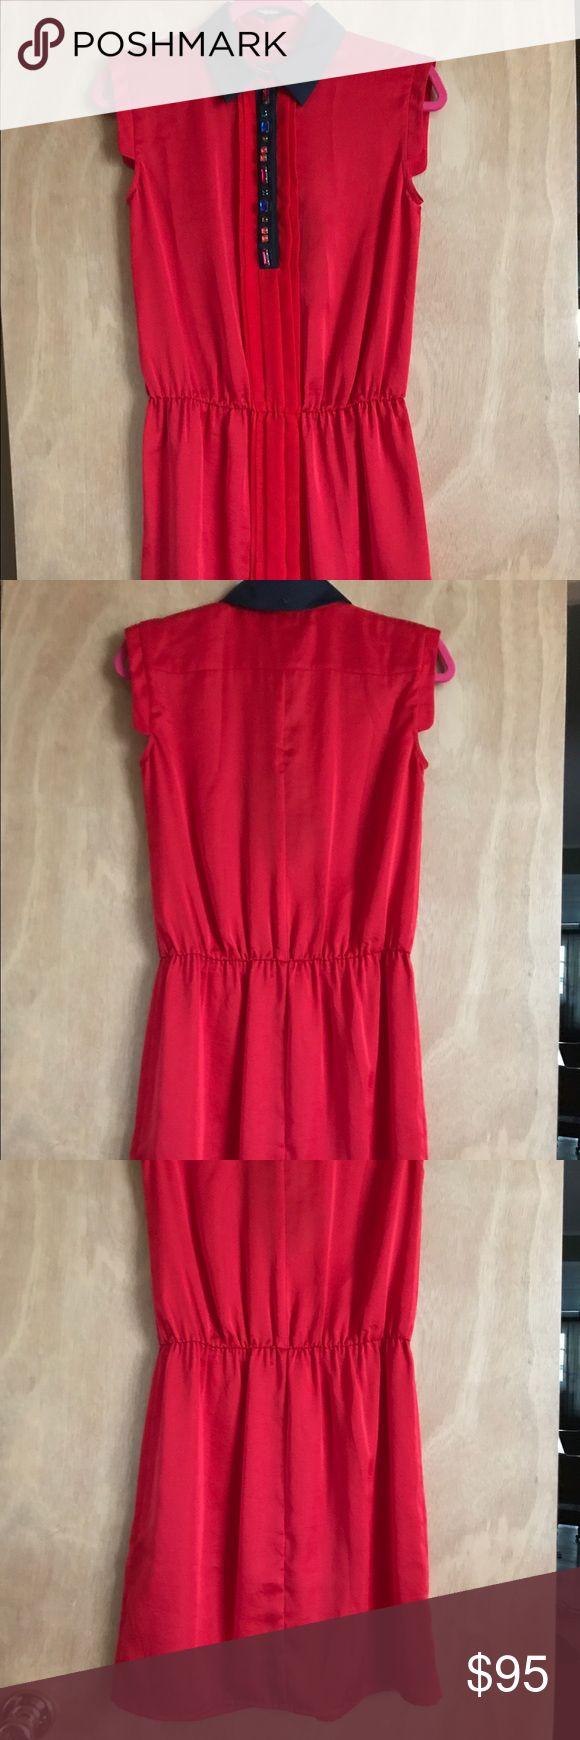 "Armani Jeans Red Color Dress Size IT 40 US 4 Brand New 100% Authentic                                                Armani Jeans Red Color Dress Size IT 40 US 4                            100% polyester                                                                                   Armpit to Armpit 16""                                                                         Lengths 36"" Armani Jeans Dresses Midi"